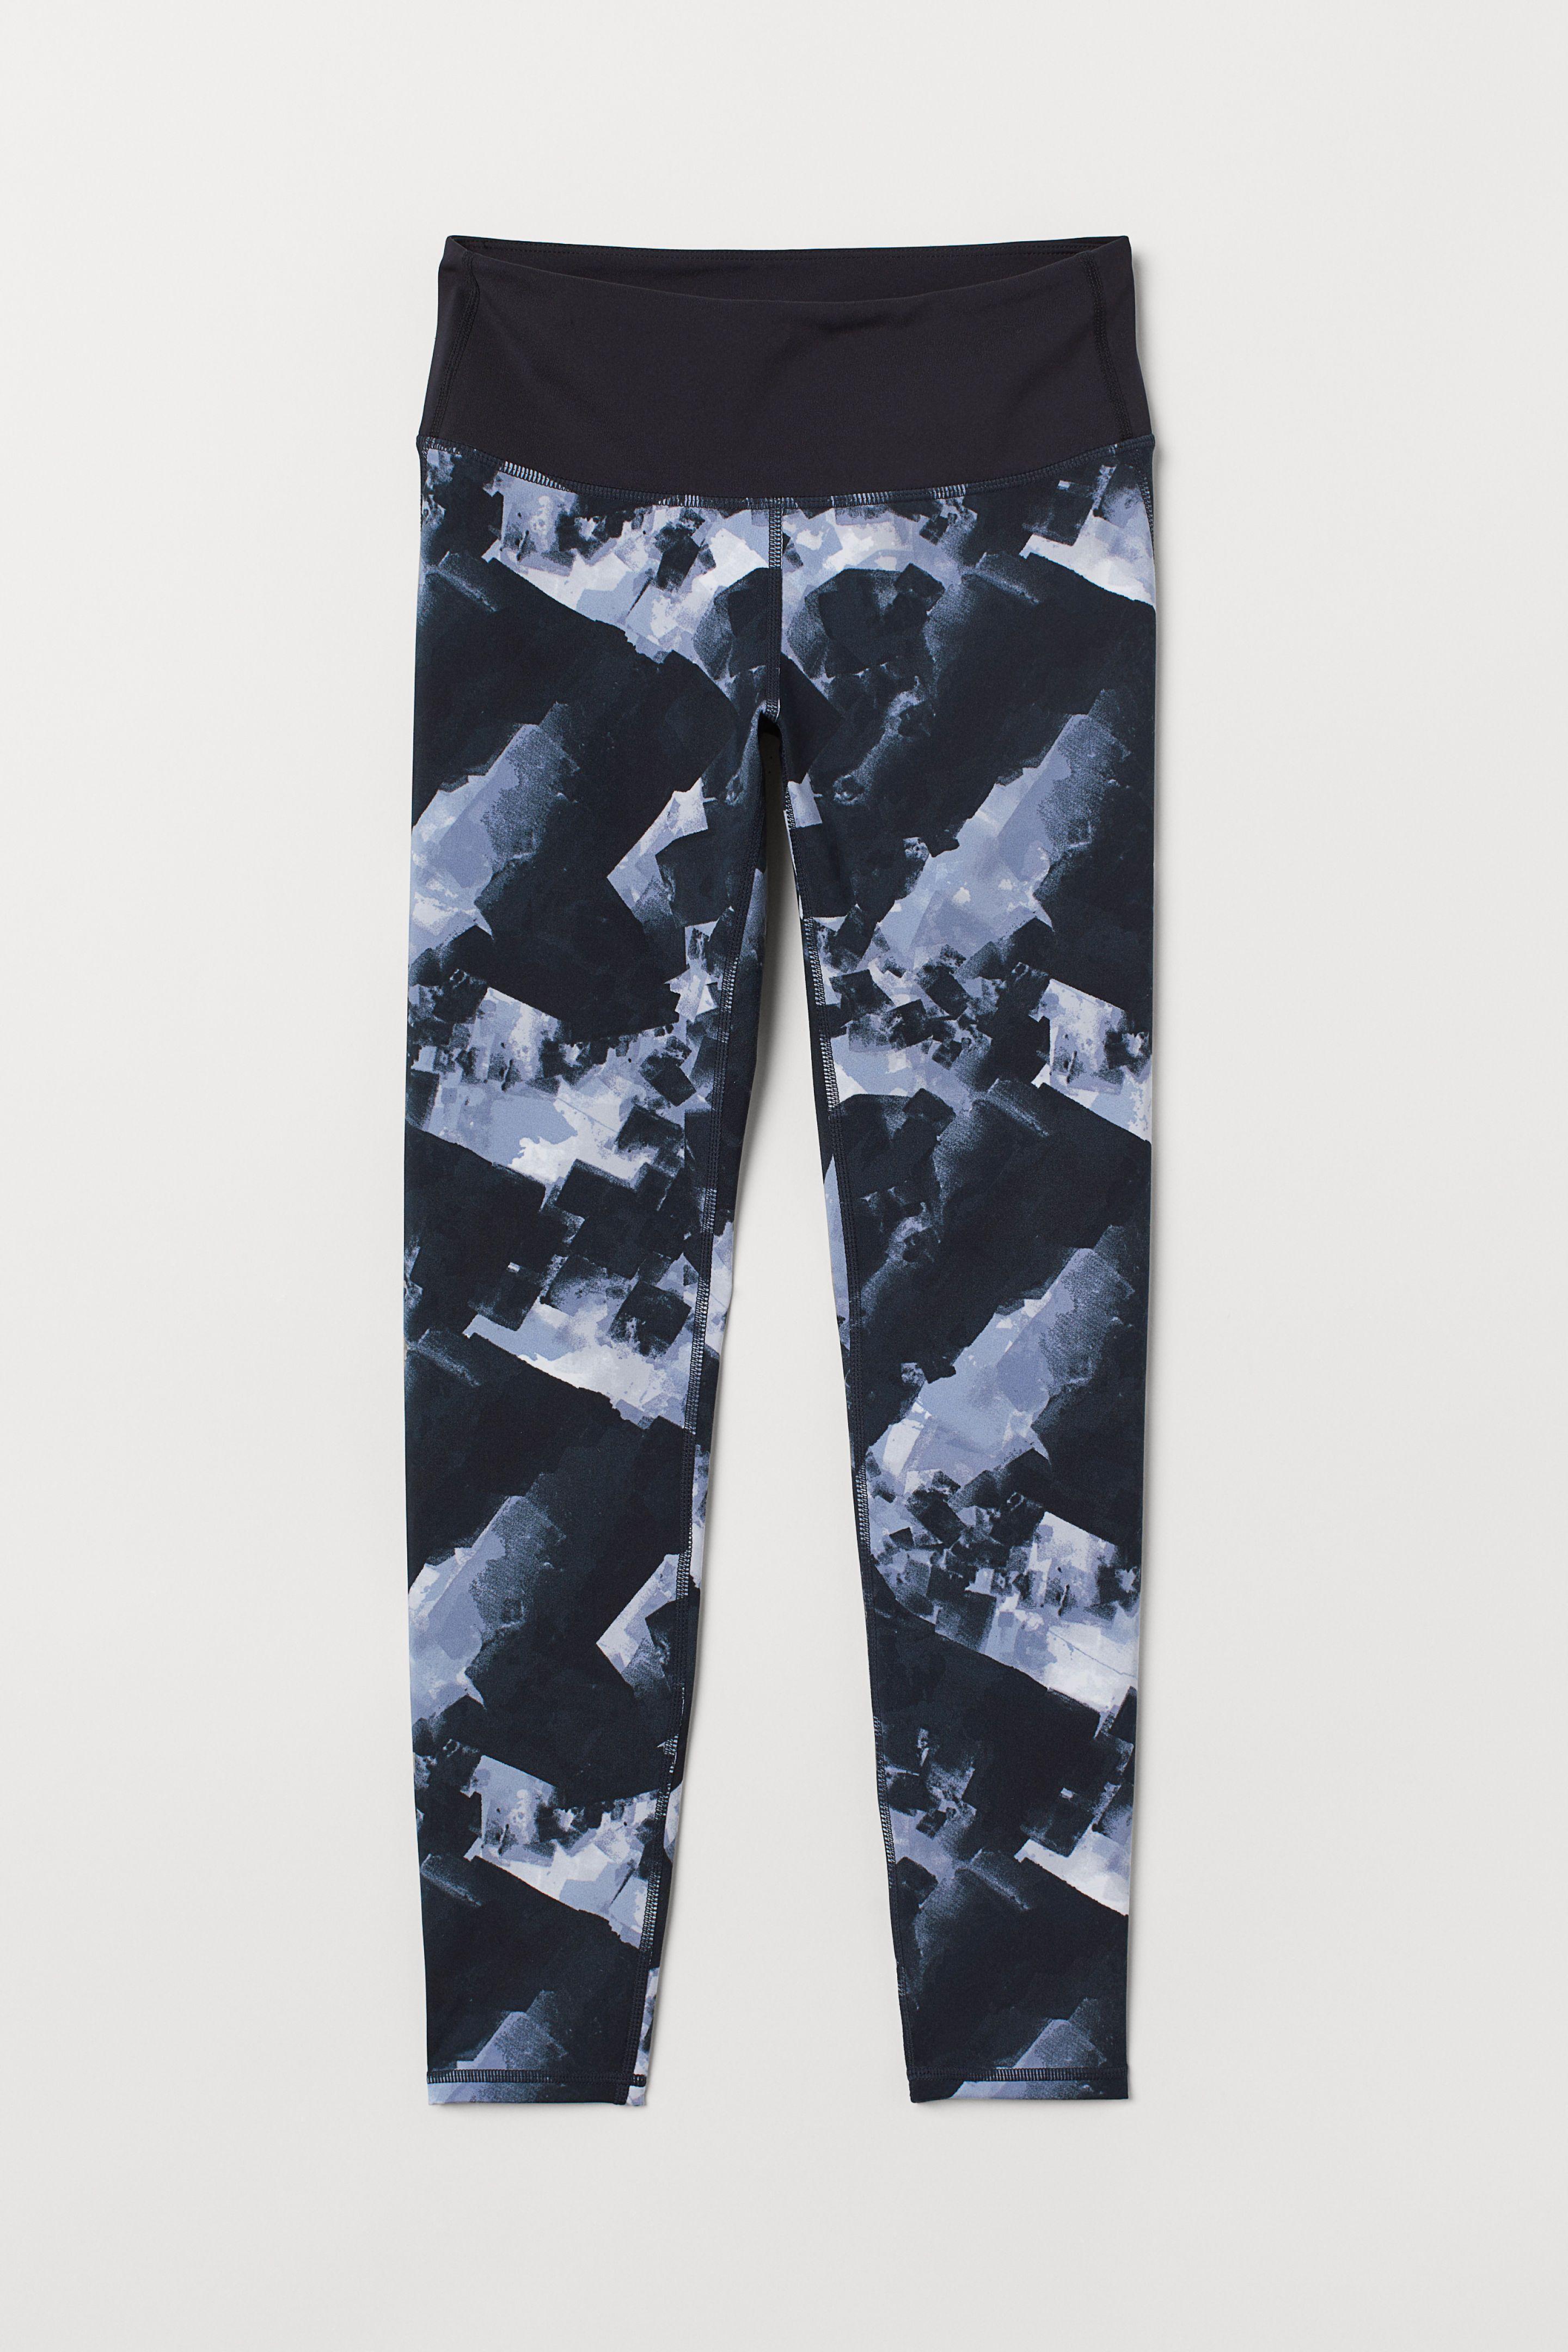 H&M yoga tights